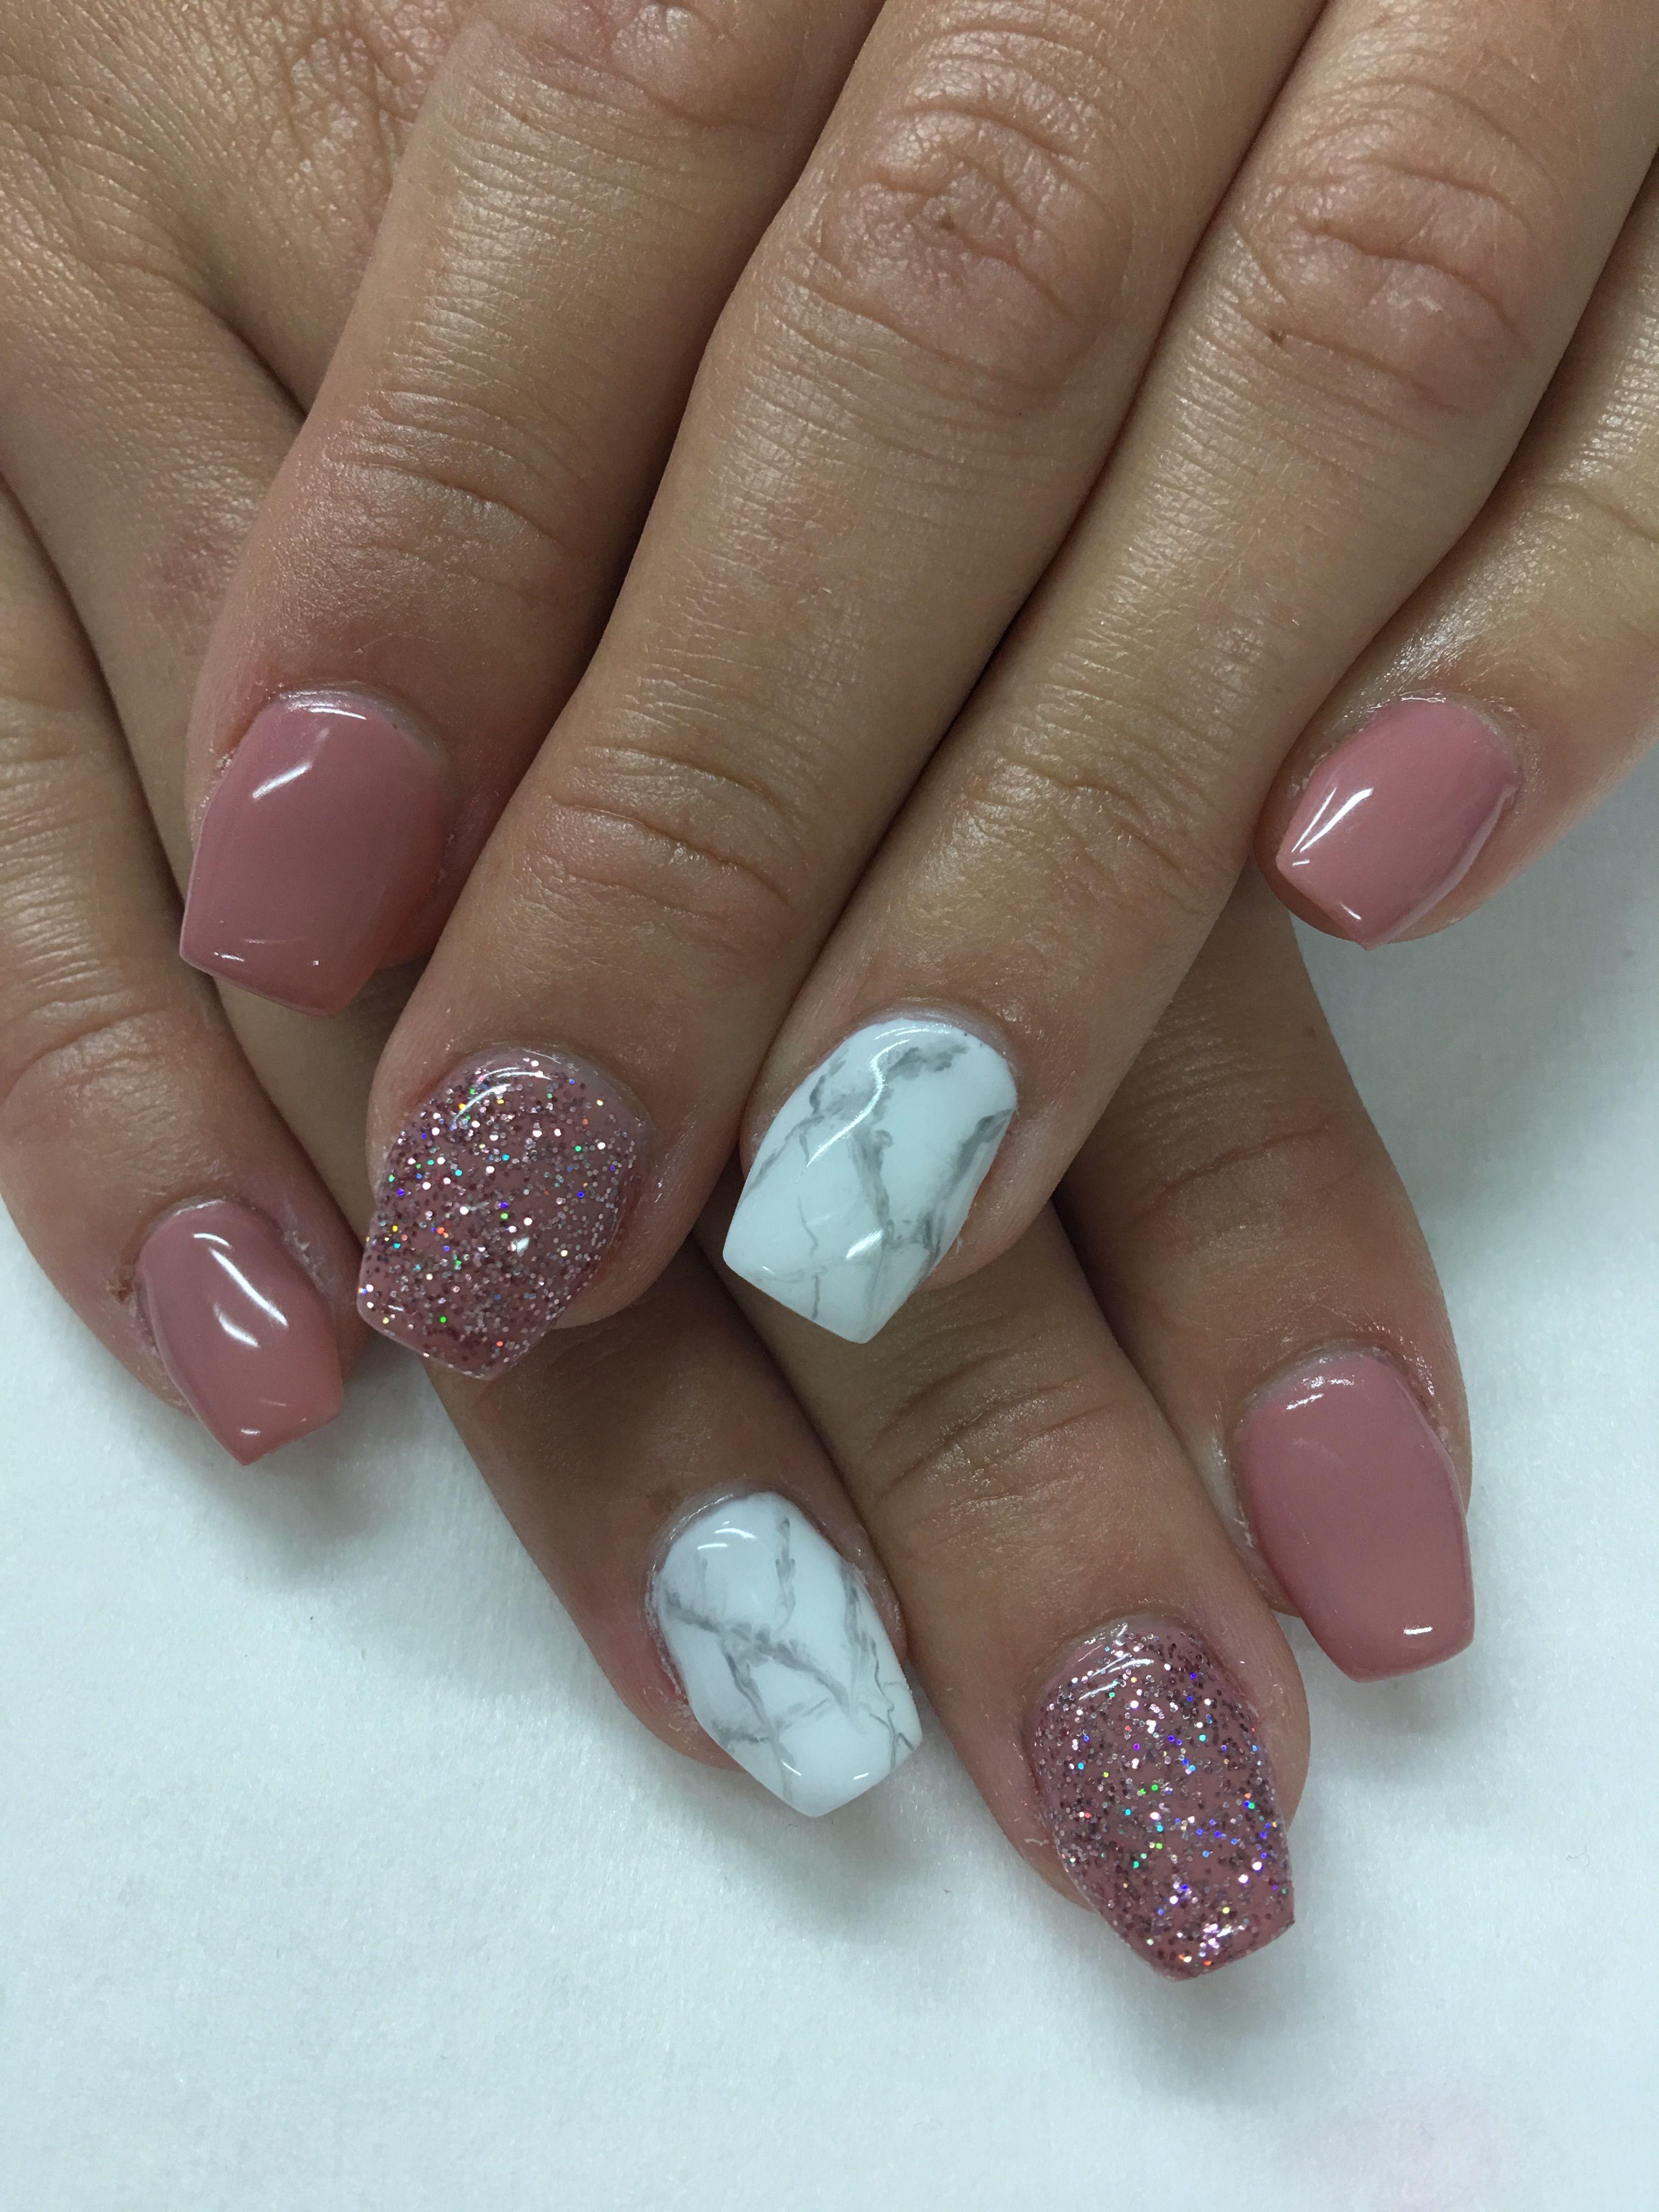 Mauve Glitter White Marble Gel Nails Gel Nail Designs Mauve Nails Glitter Gel Nails